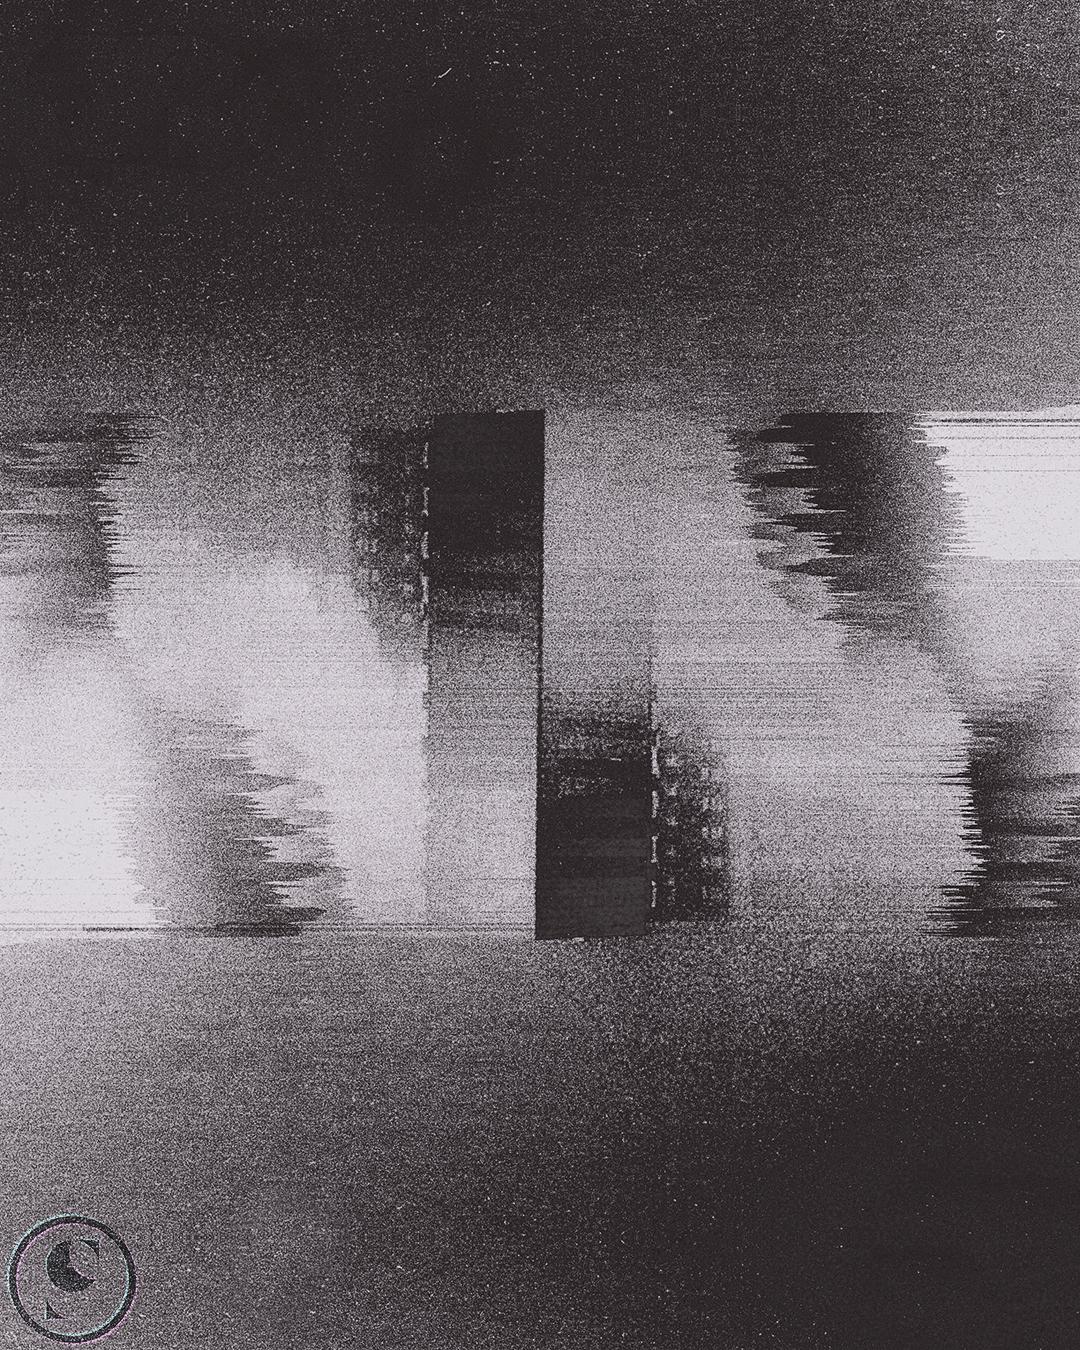 19-08-02-Fog2Insta8BWM.jpg